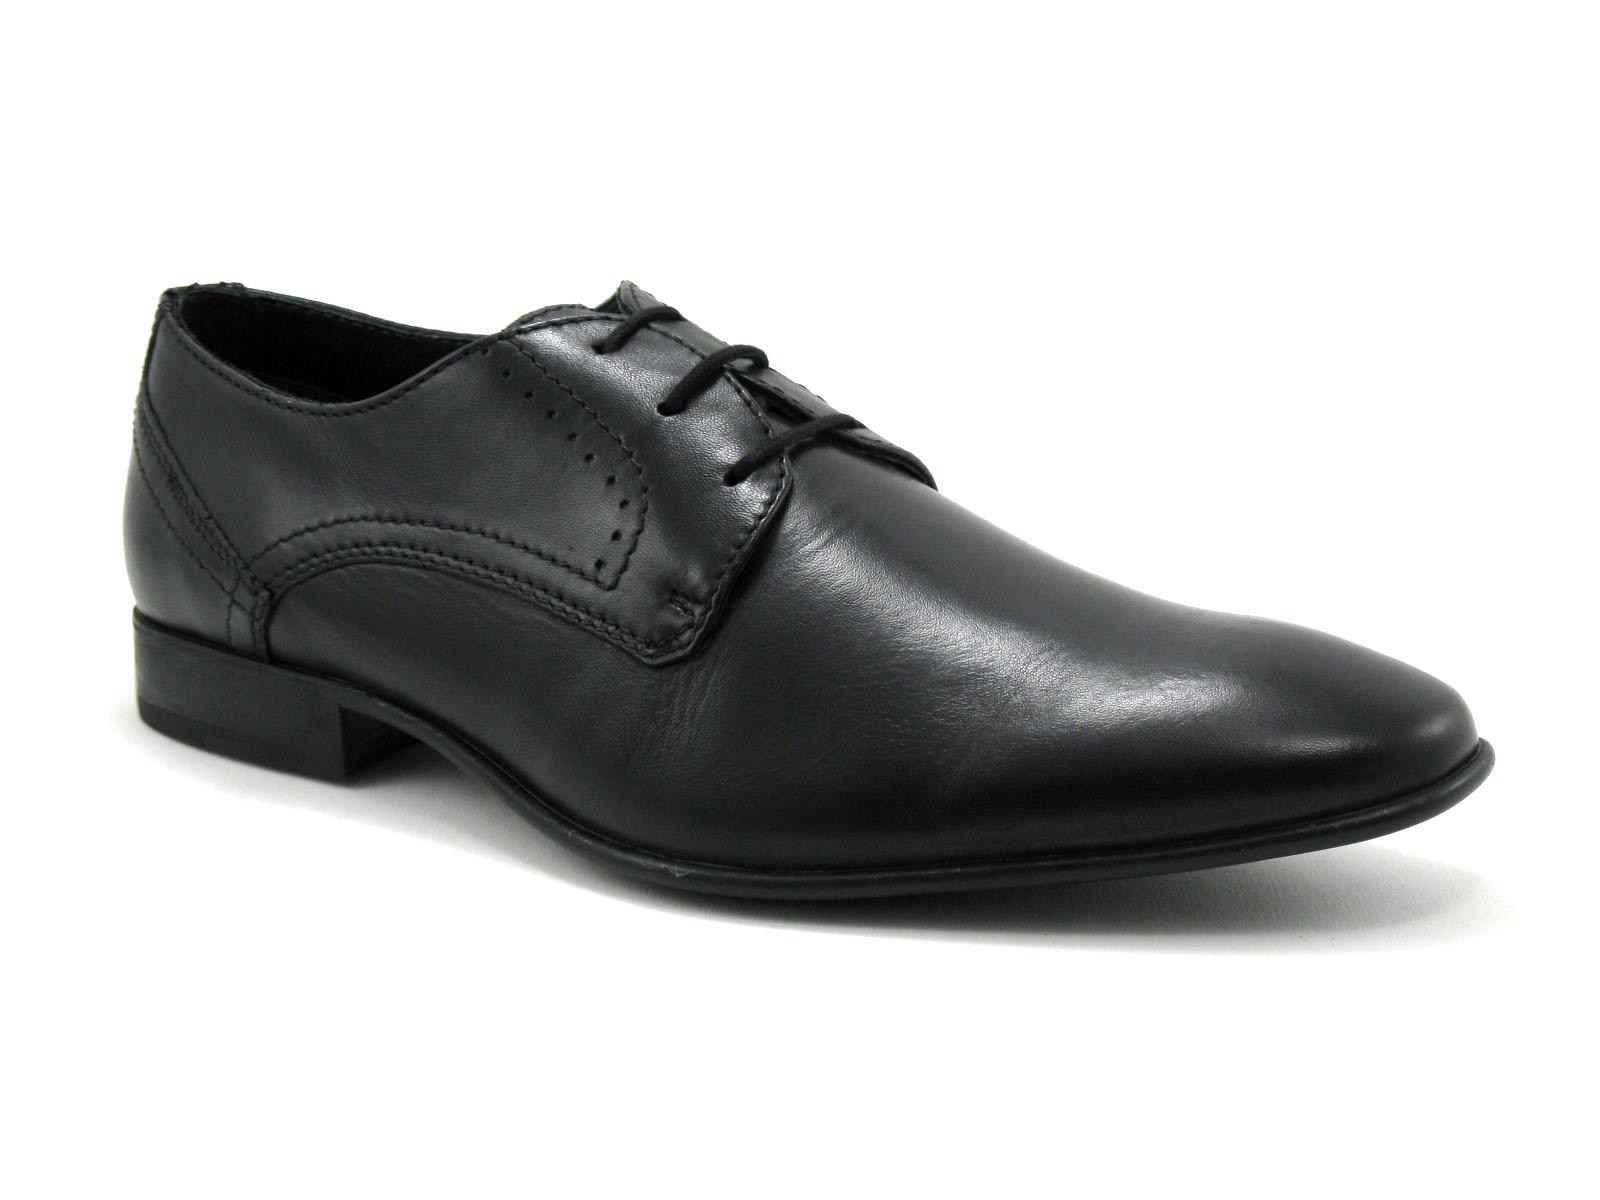 Chaussure habillée Homme Fluchos 1857901